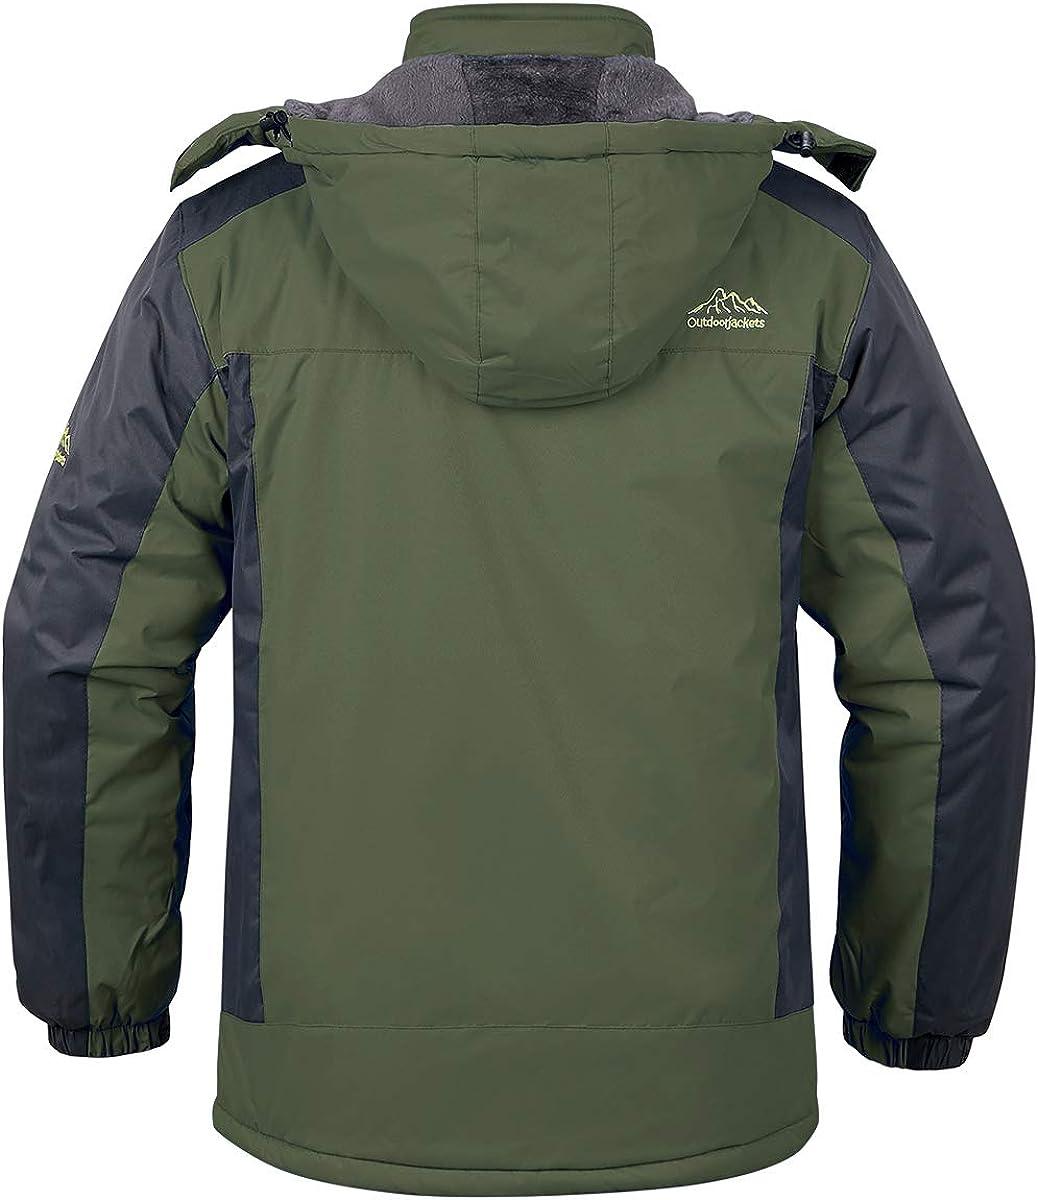 MANSDOUR Mens Ski Jacket Winter Warm Snow Coat Waterproof Fleece Outdoor Windbreaker Hooded Snowboarding Jacket